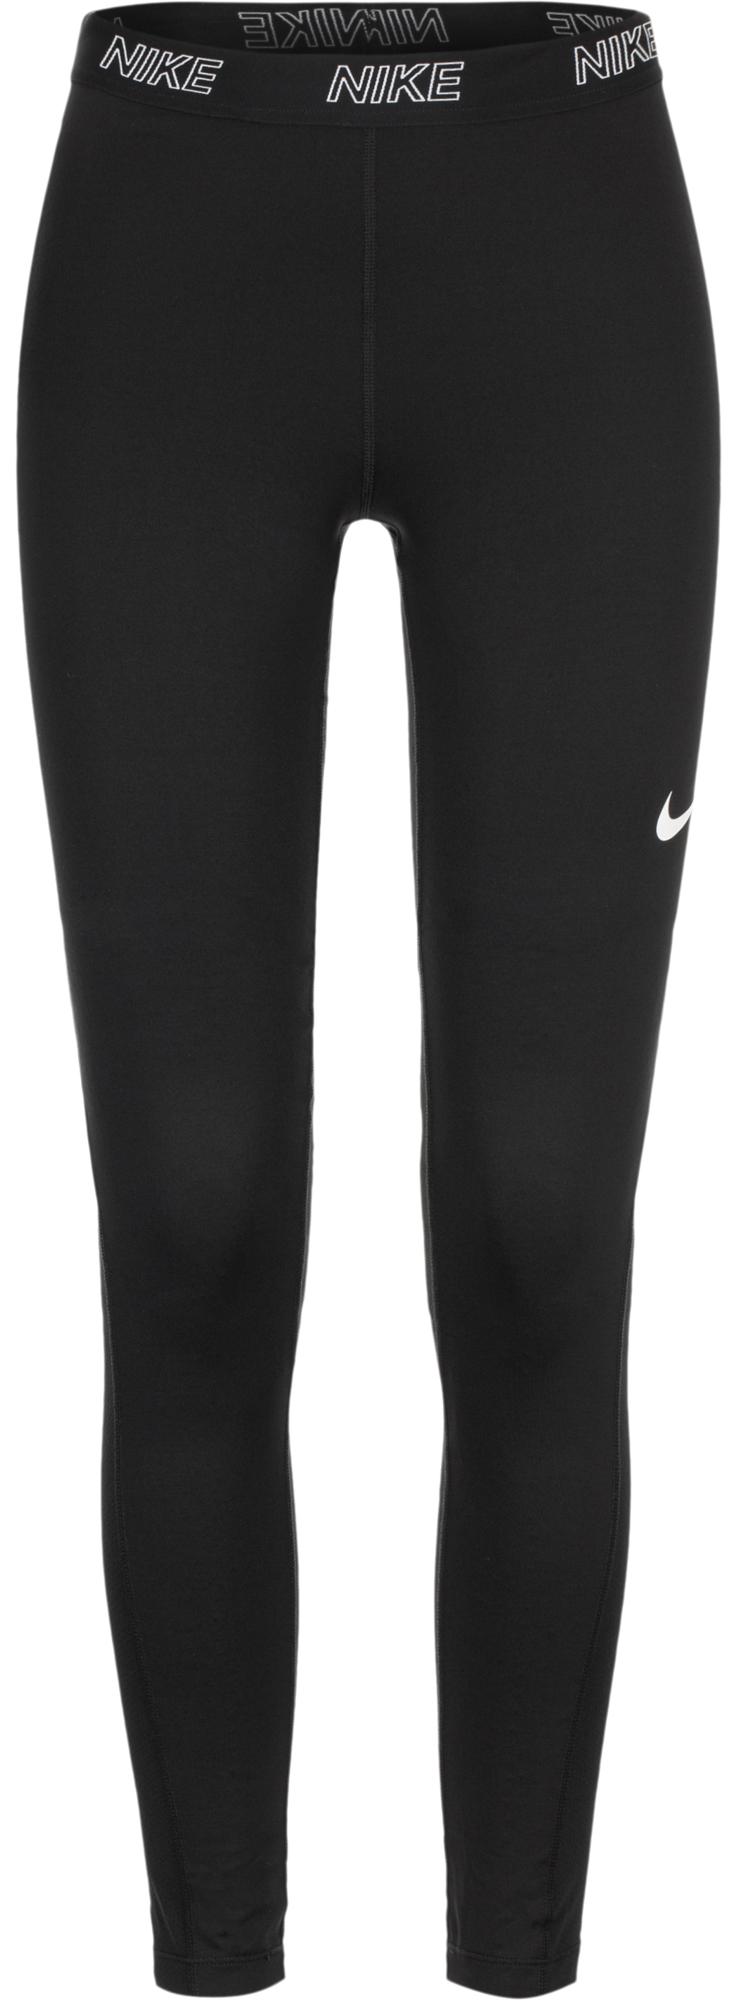 Nike Легинсы женские Nike Victory Baselayer, размер 48-50 nike легинсы женские nike sculpt hyper